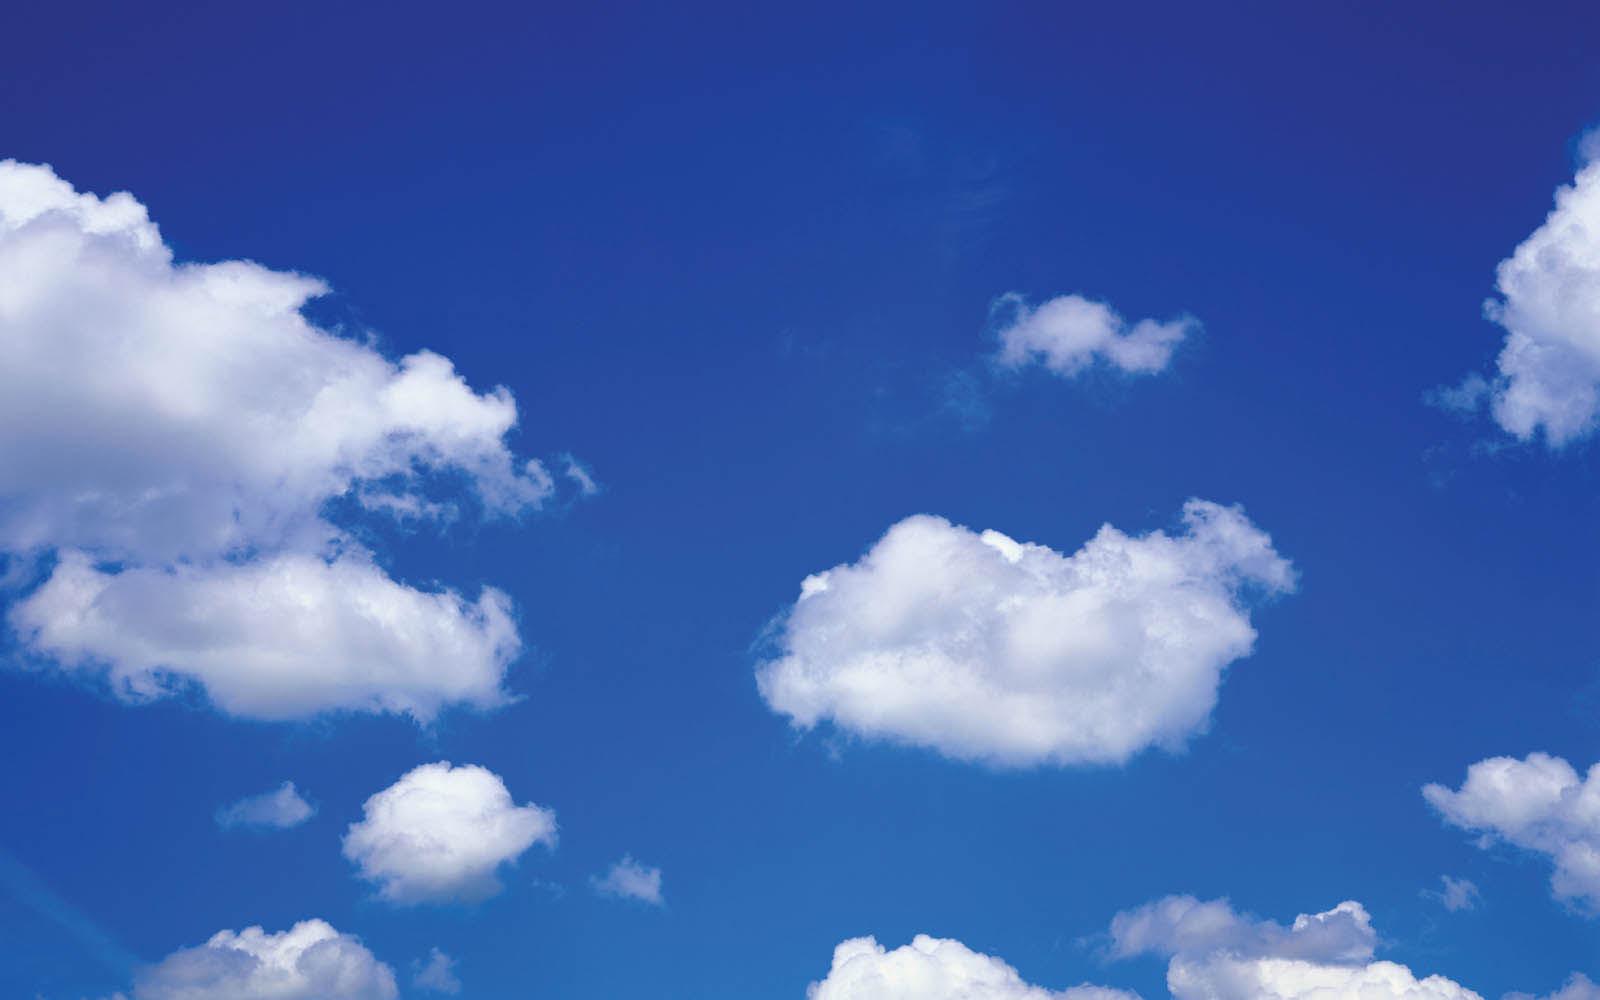 wallpapers blue sky backgrounds blue sky desktop backgrounds blue sky 1600x1000